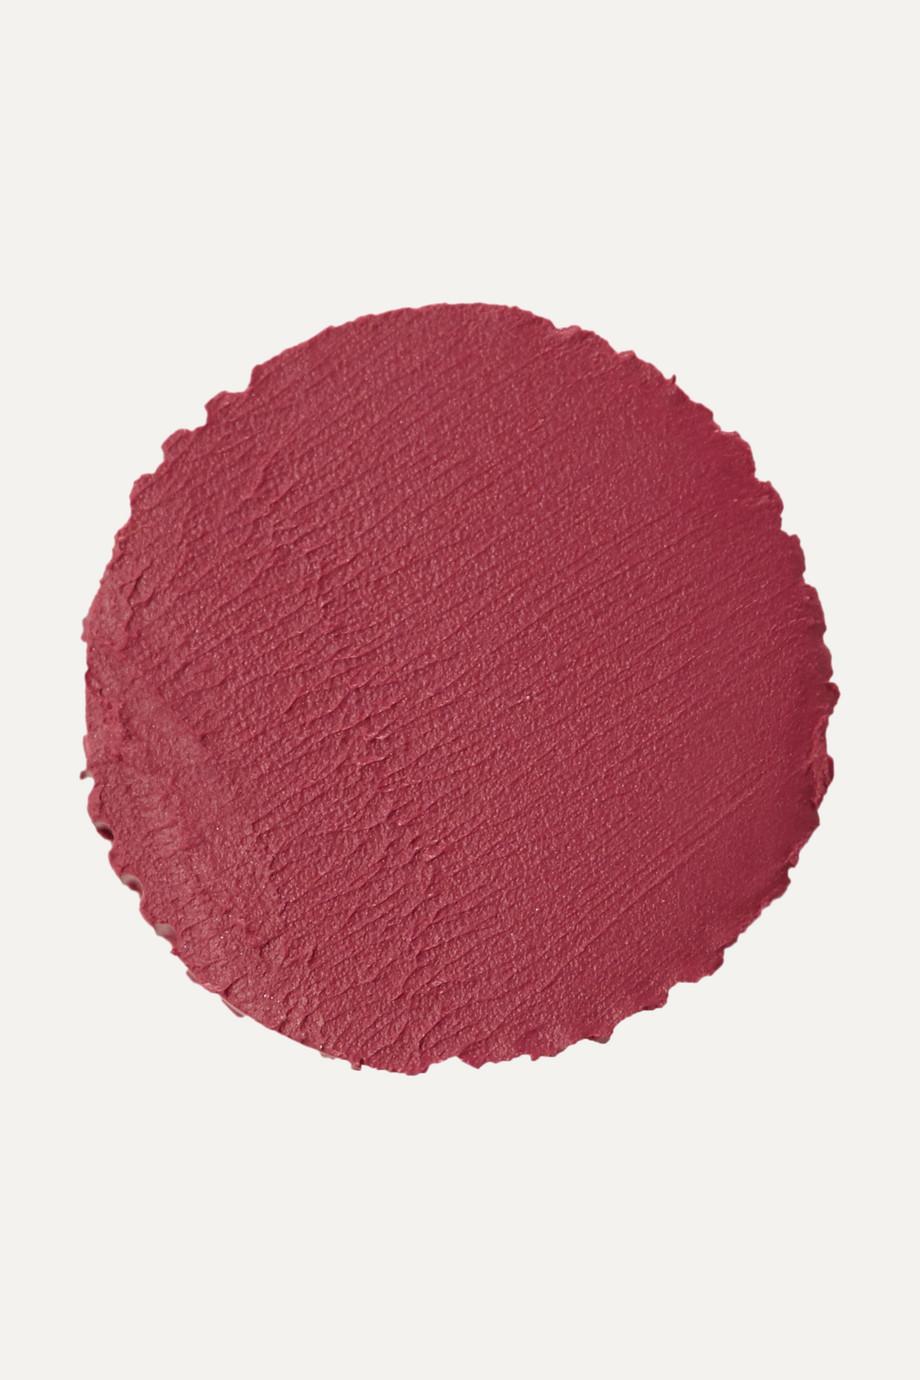 Burberry Beauty Lip Velvet - Rosewood No.421